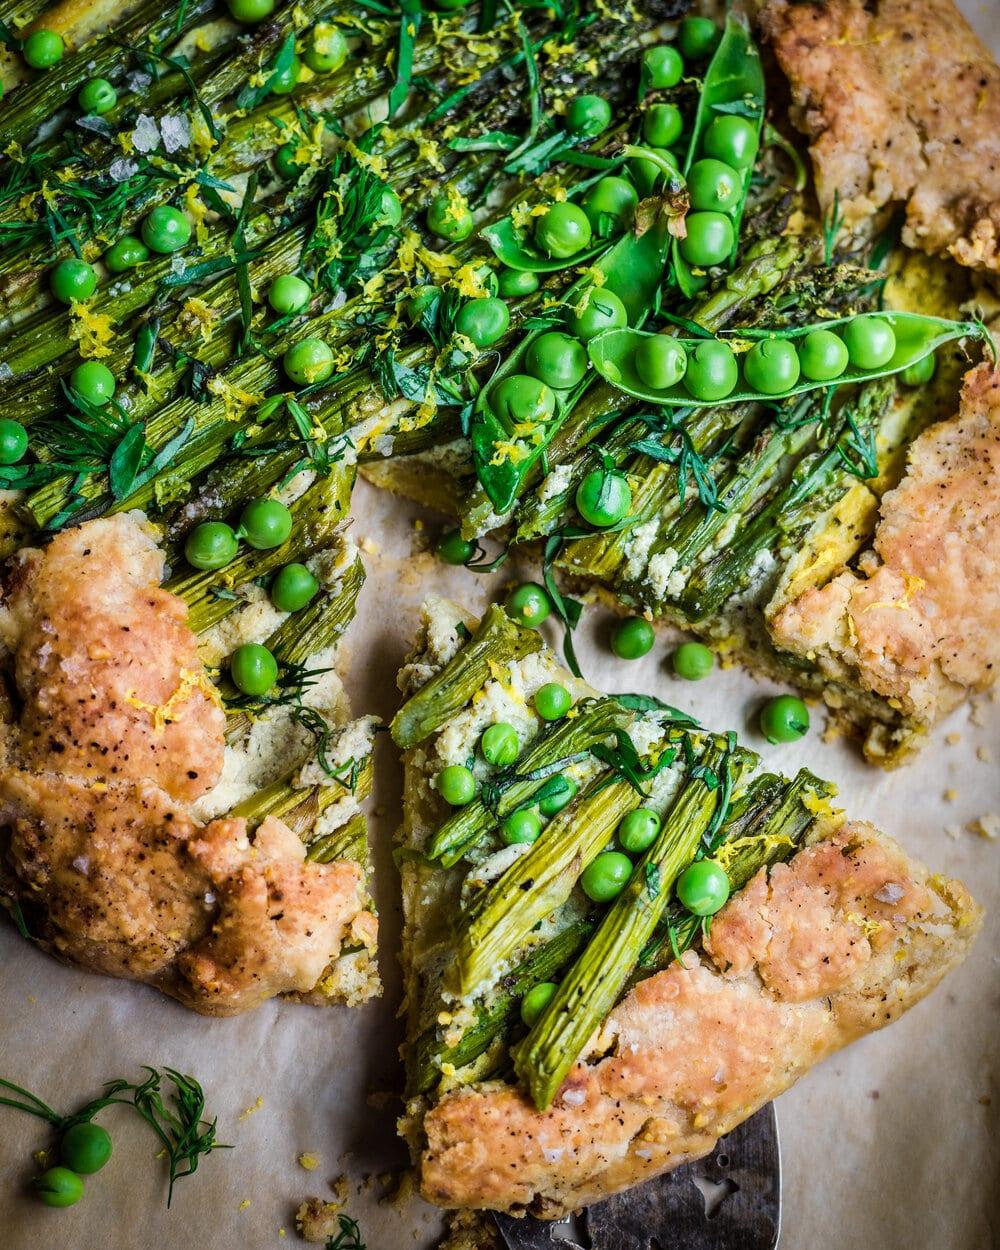 Savory Asparagus Galette with Vegan Ricotta